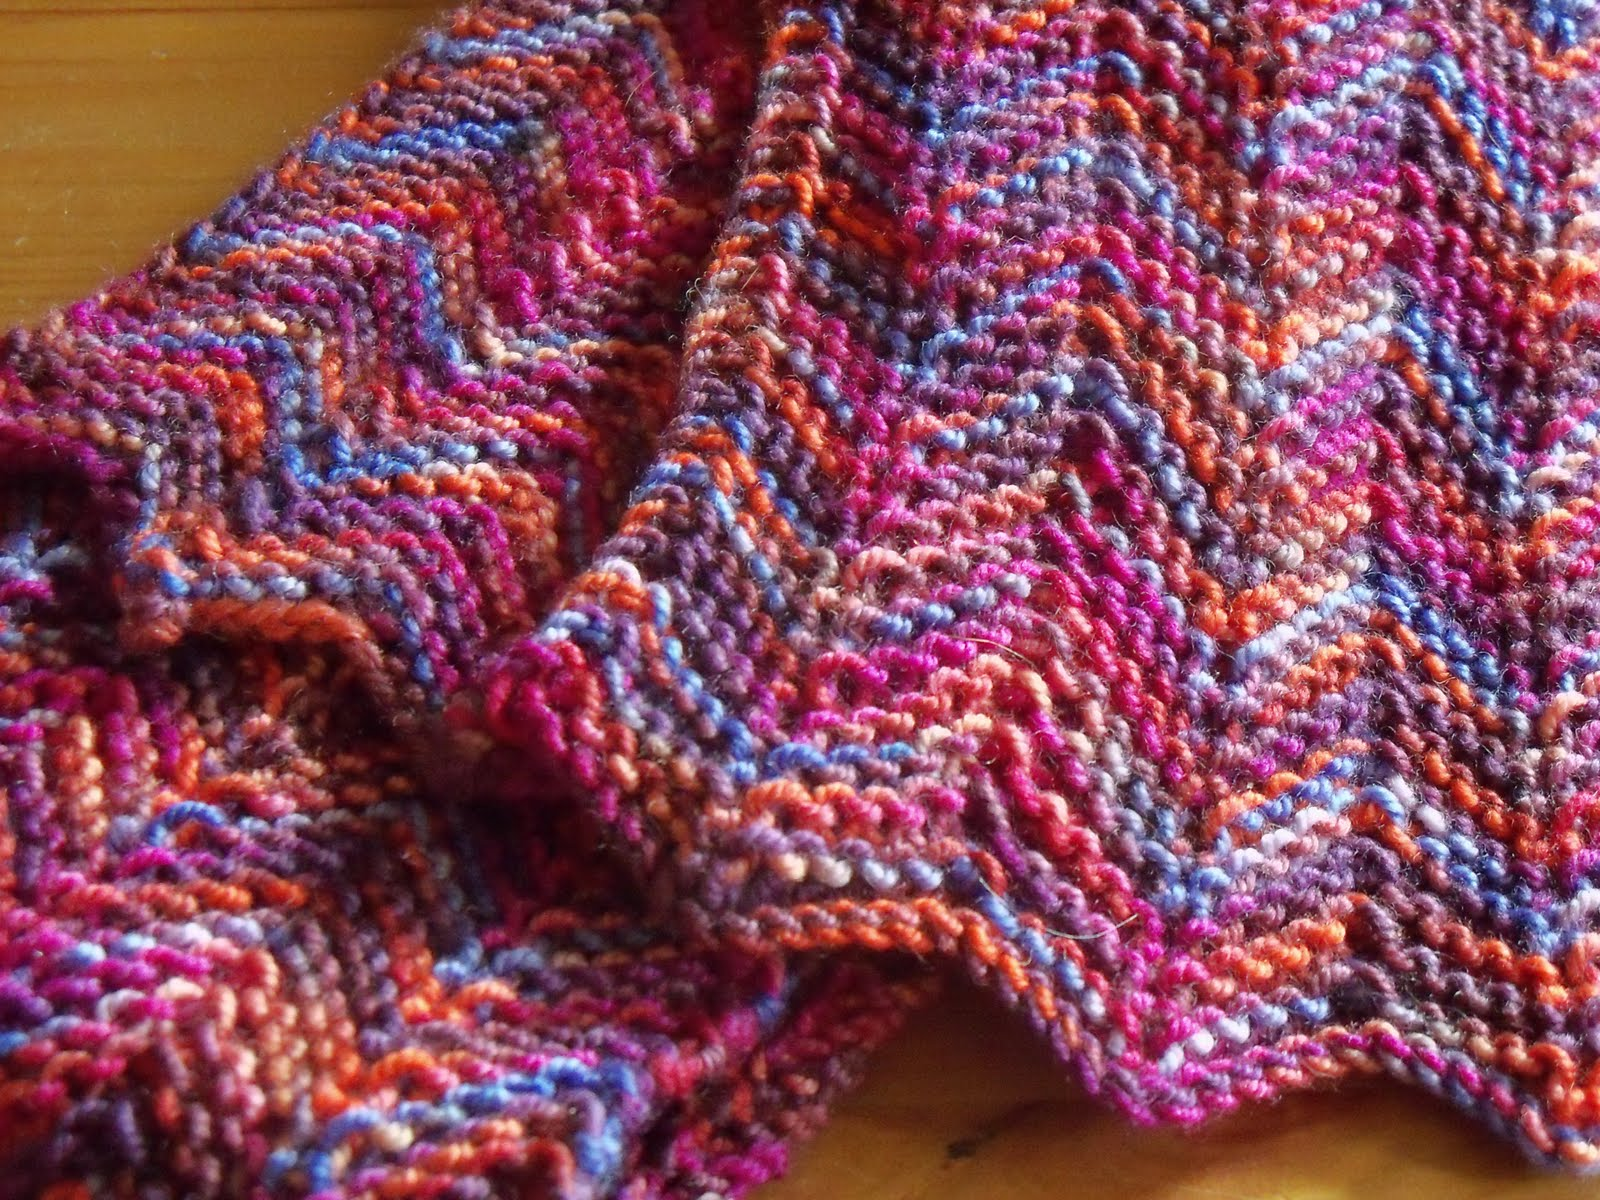 Crochet Patterns Using Sock Yarn : massive stash of appealing single skeins, many of these sock yarns ...